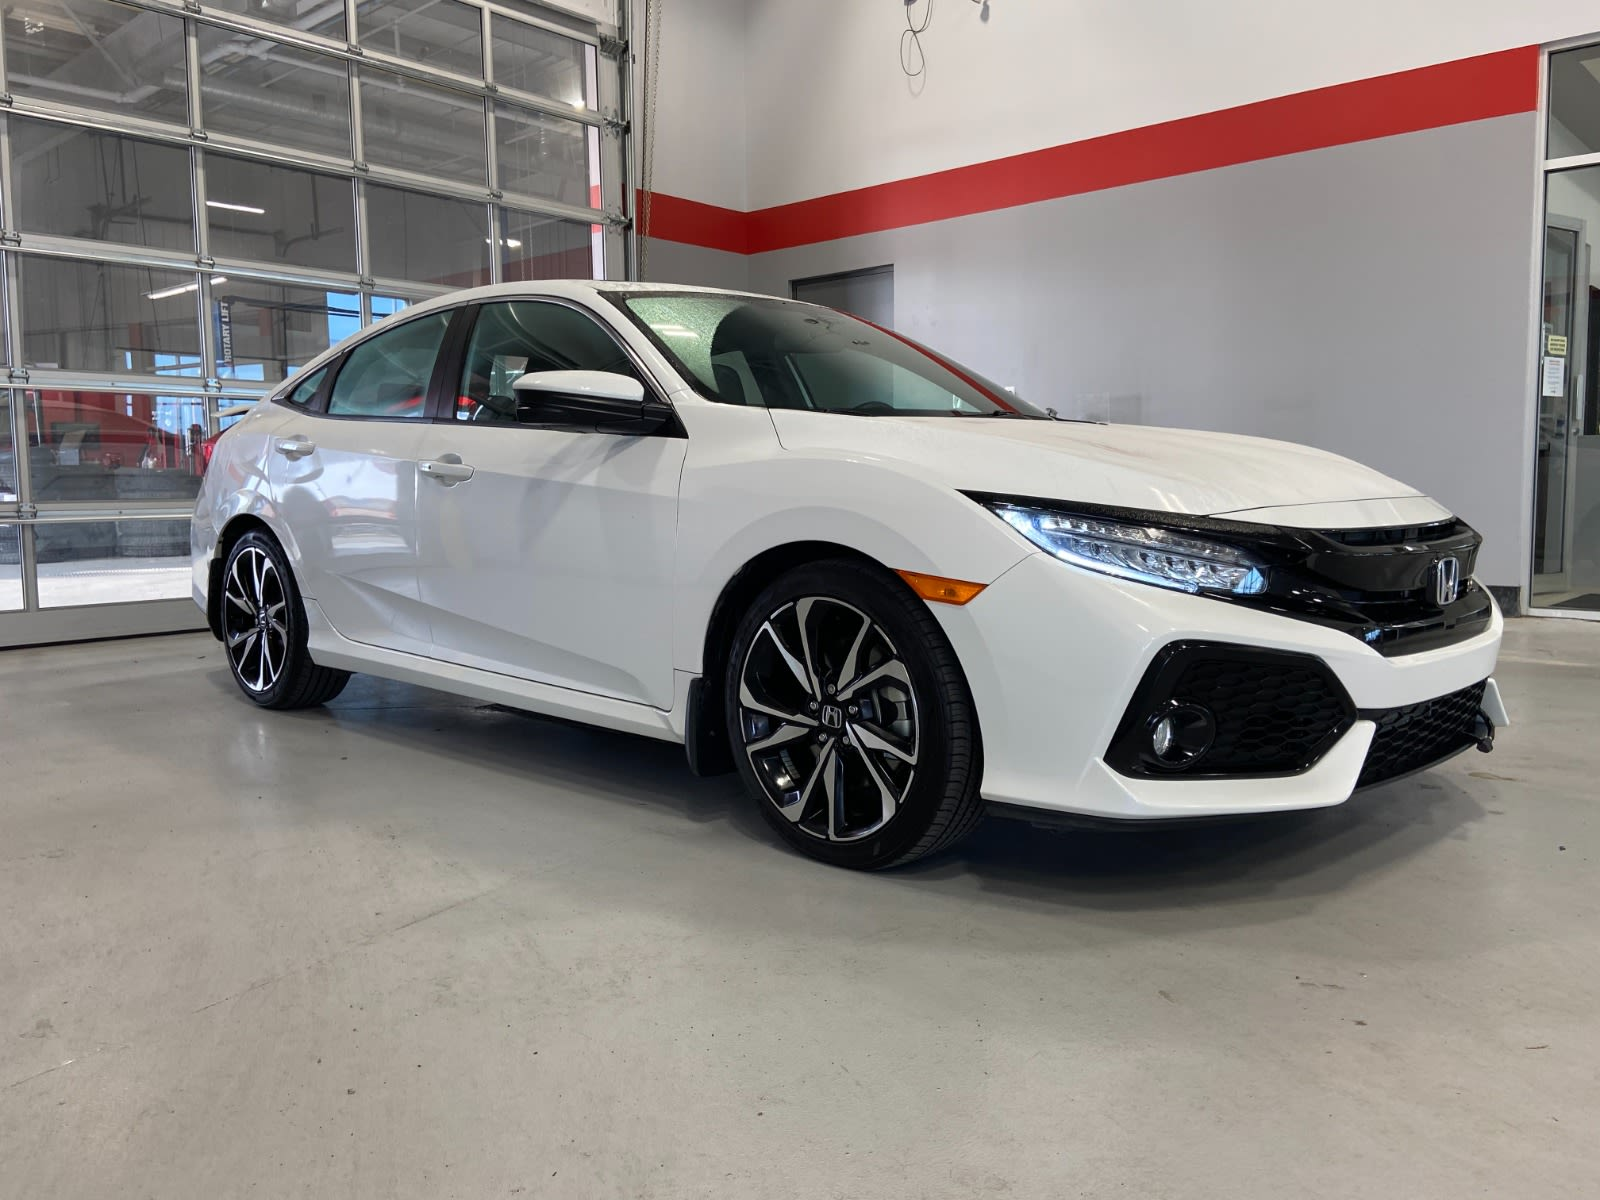 2019 Honda Civic Si FWD